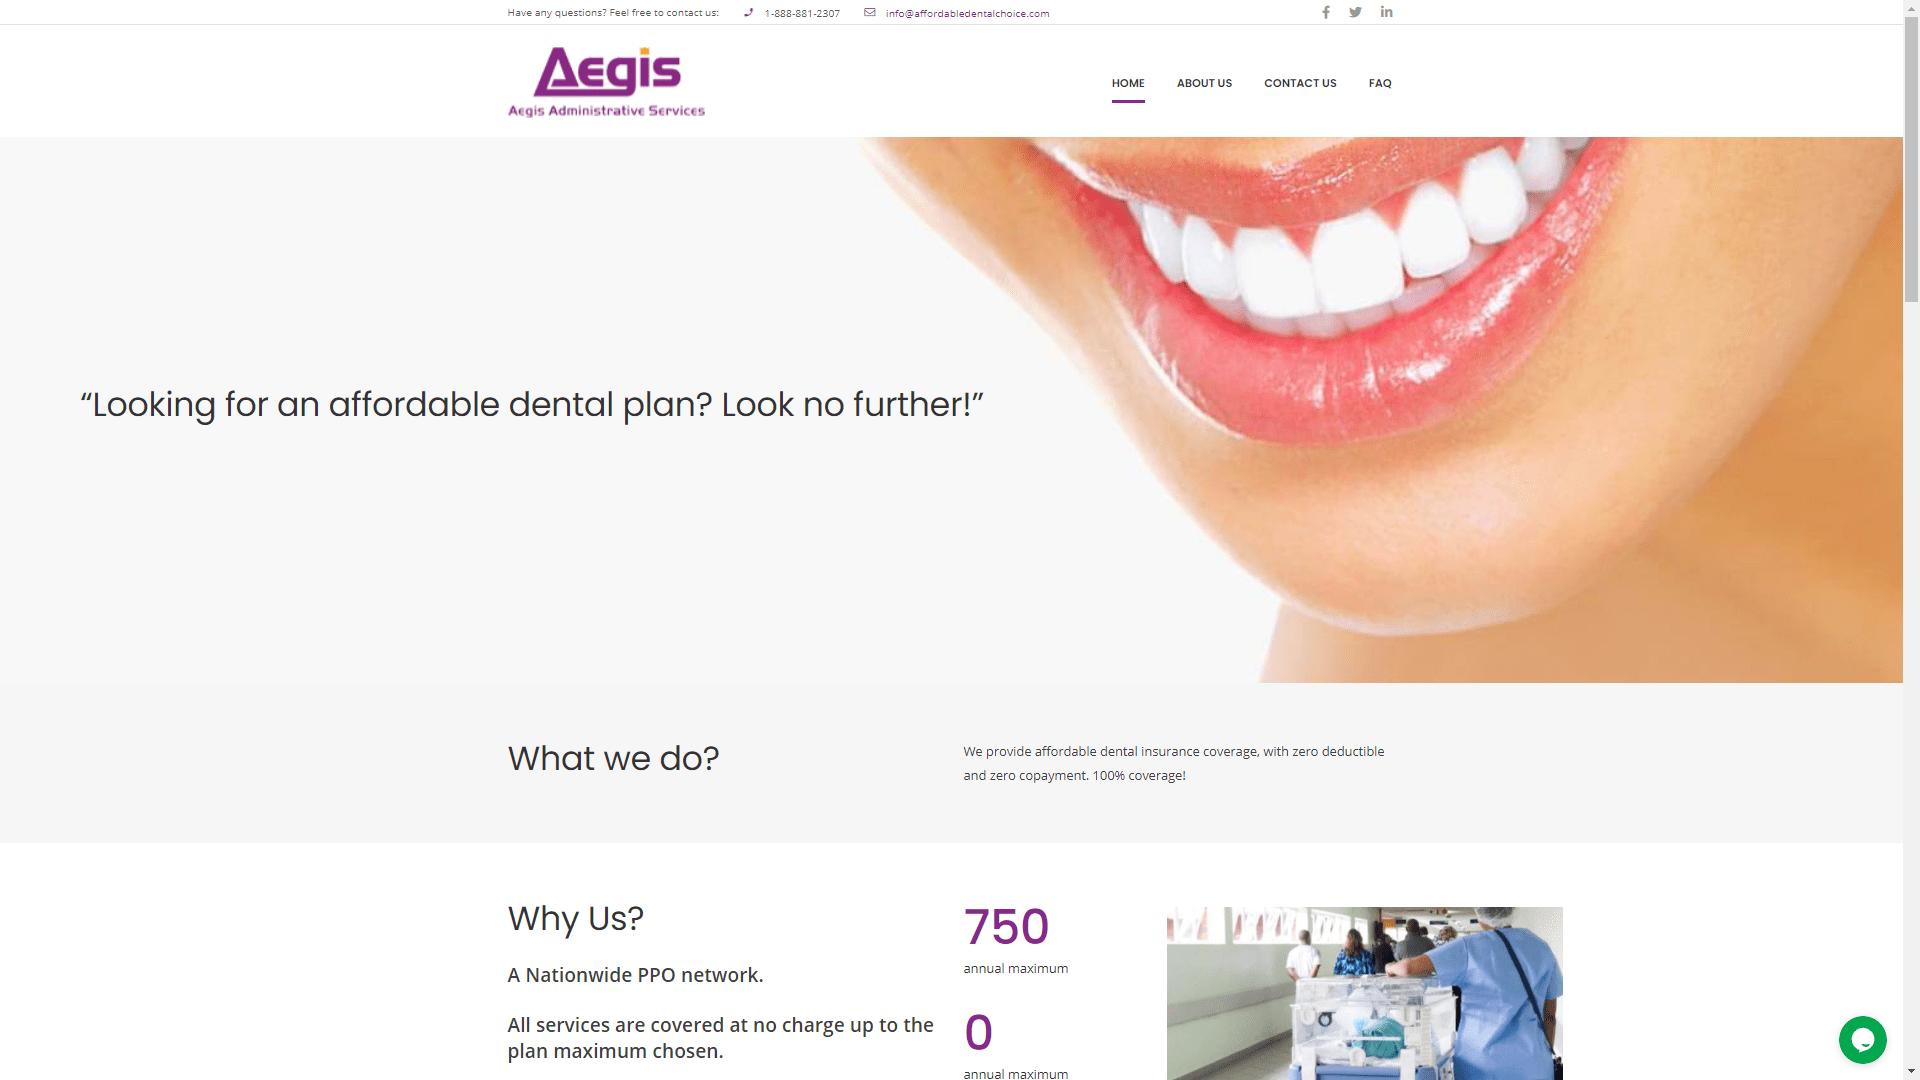 affordabledentalchoice.com